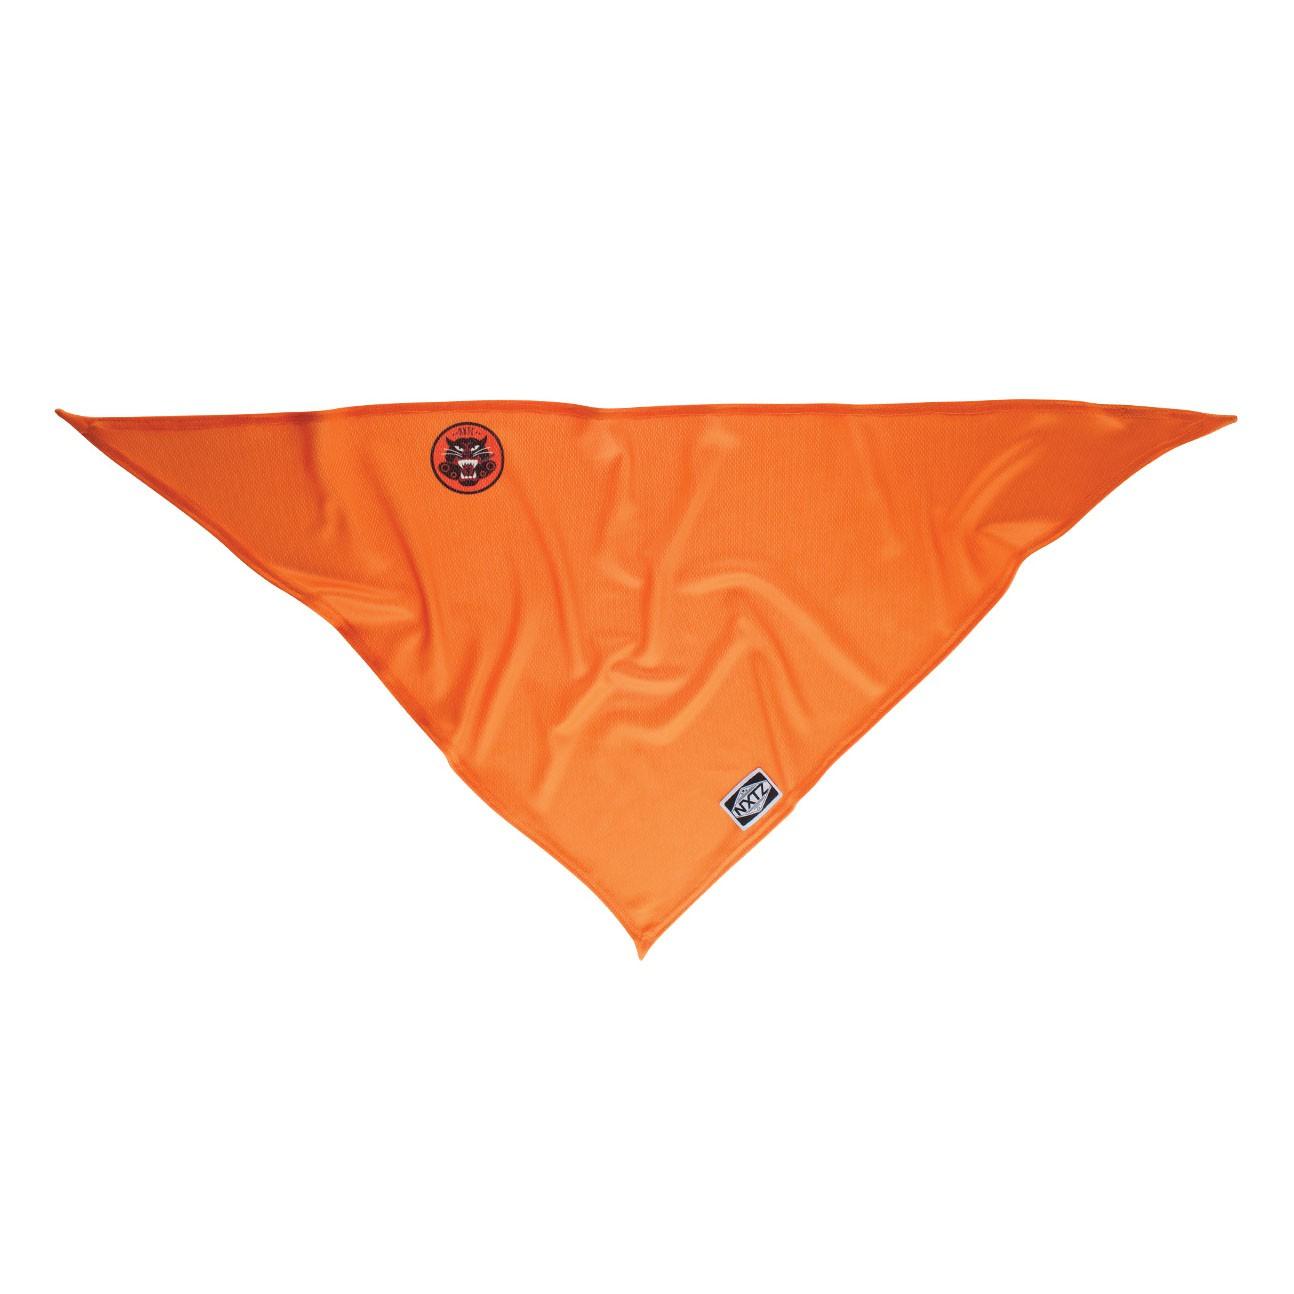 Šátek NXTZ Single Layer Bandana crush orange